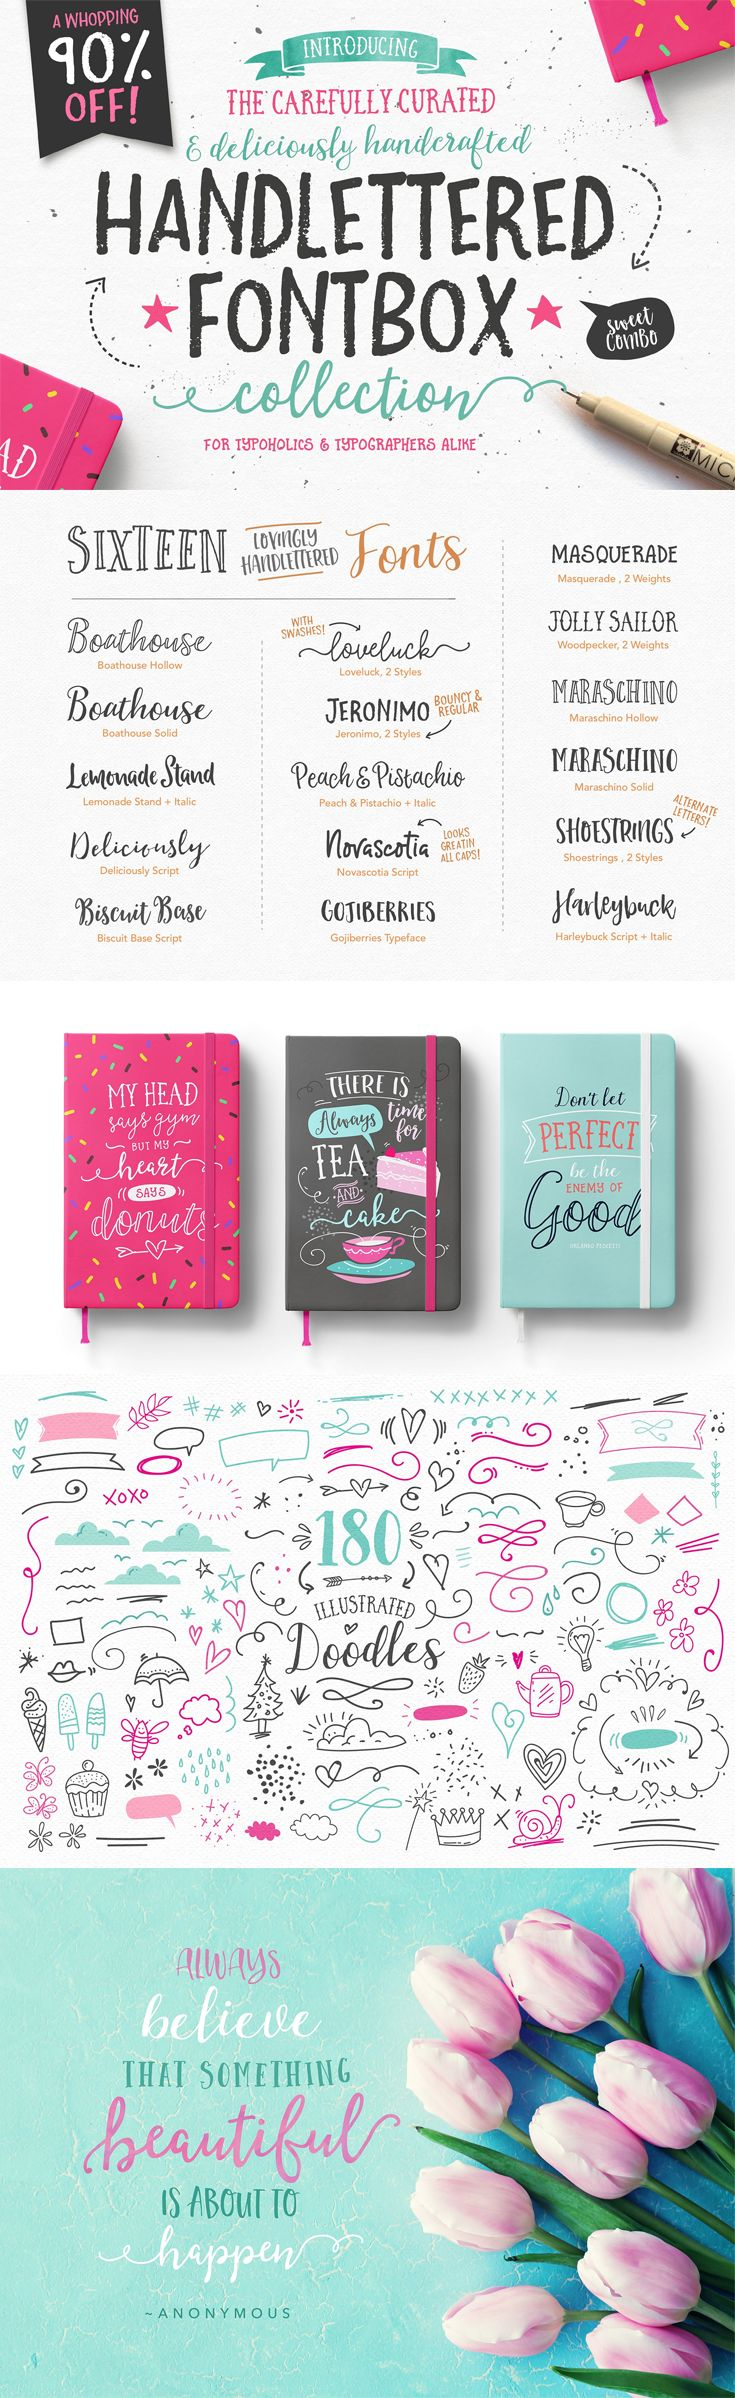 Handlettered fonts, calligraphy fonts, wedding fonts, logos, branding, brush script, feminine, typography